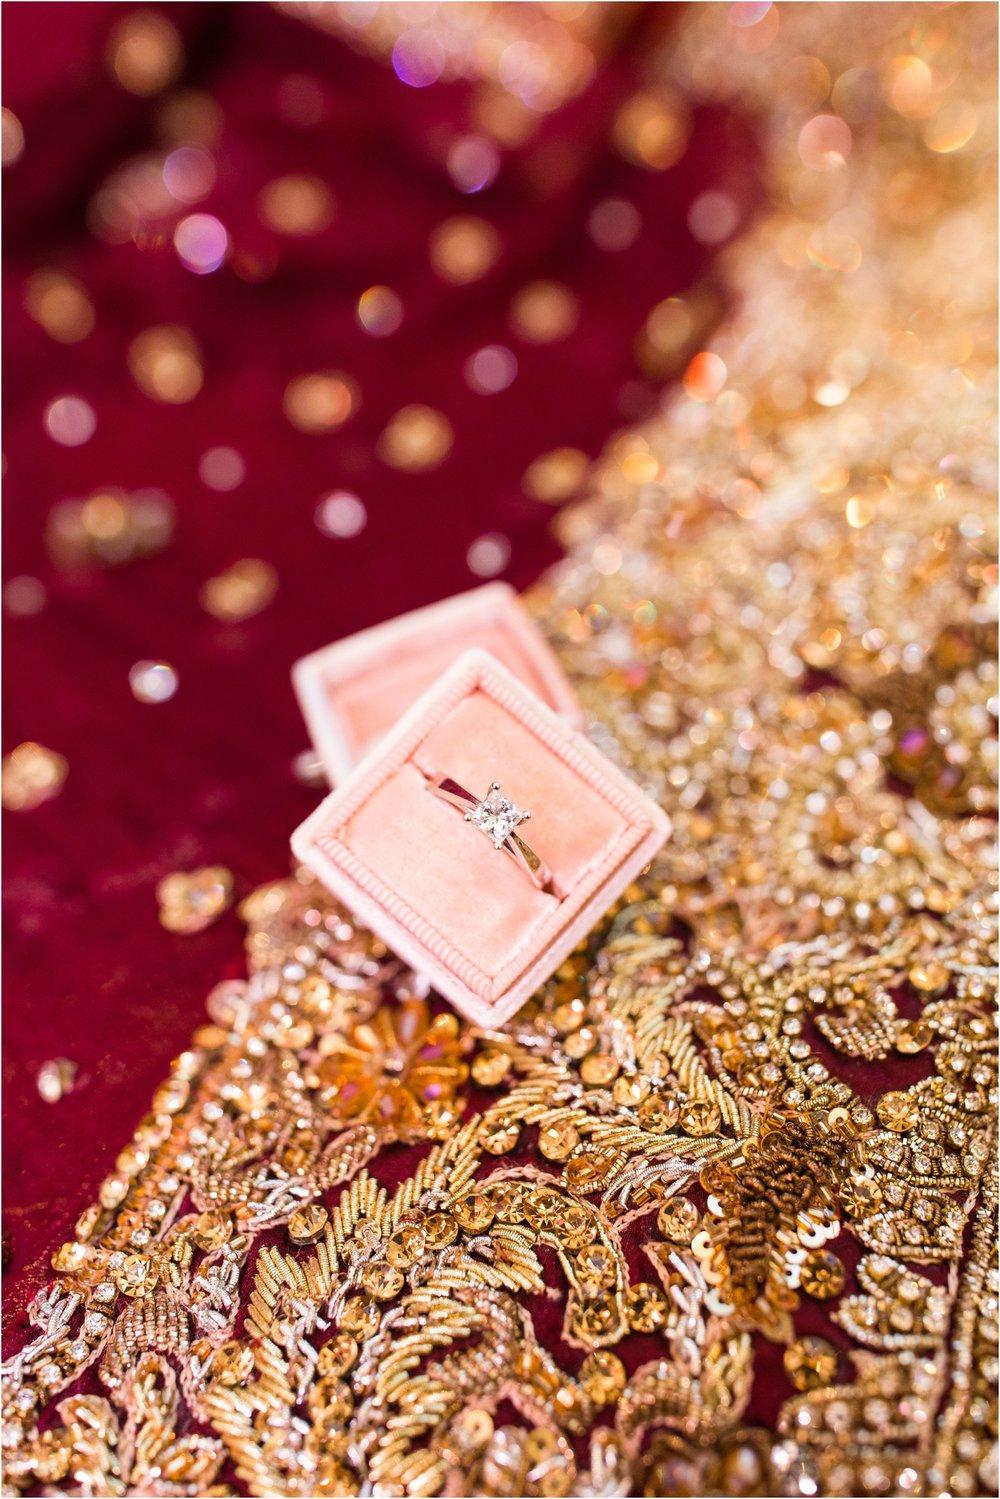 Scarborough-Convention-Centre-Baraat-Toronto-Mississauga-Brampton-Scarborough-GTA-Pakistani-Indian-Wedding-Engagement-Photographer-Photography_0002.jpg